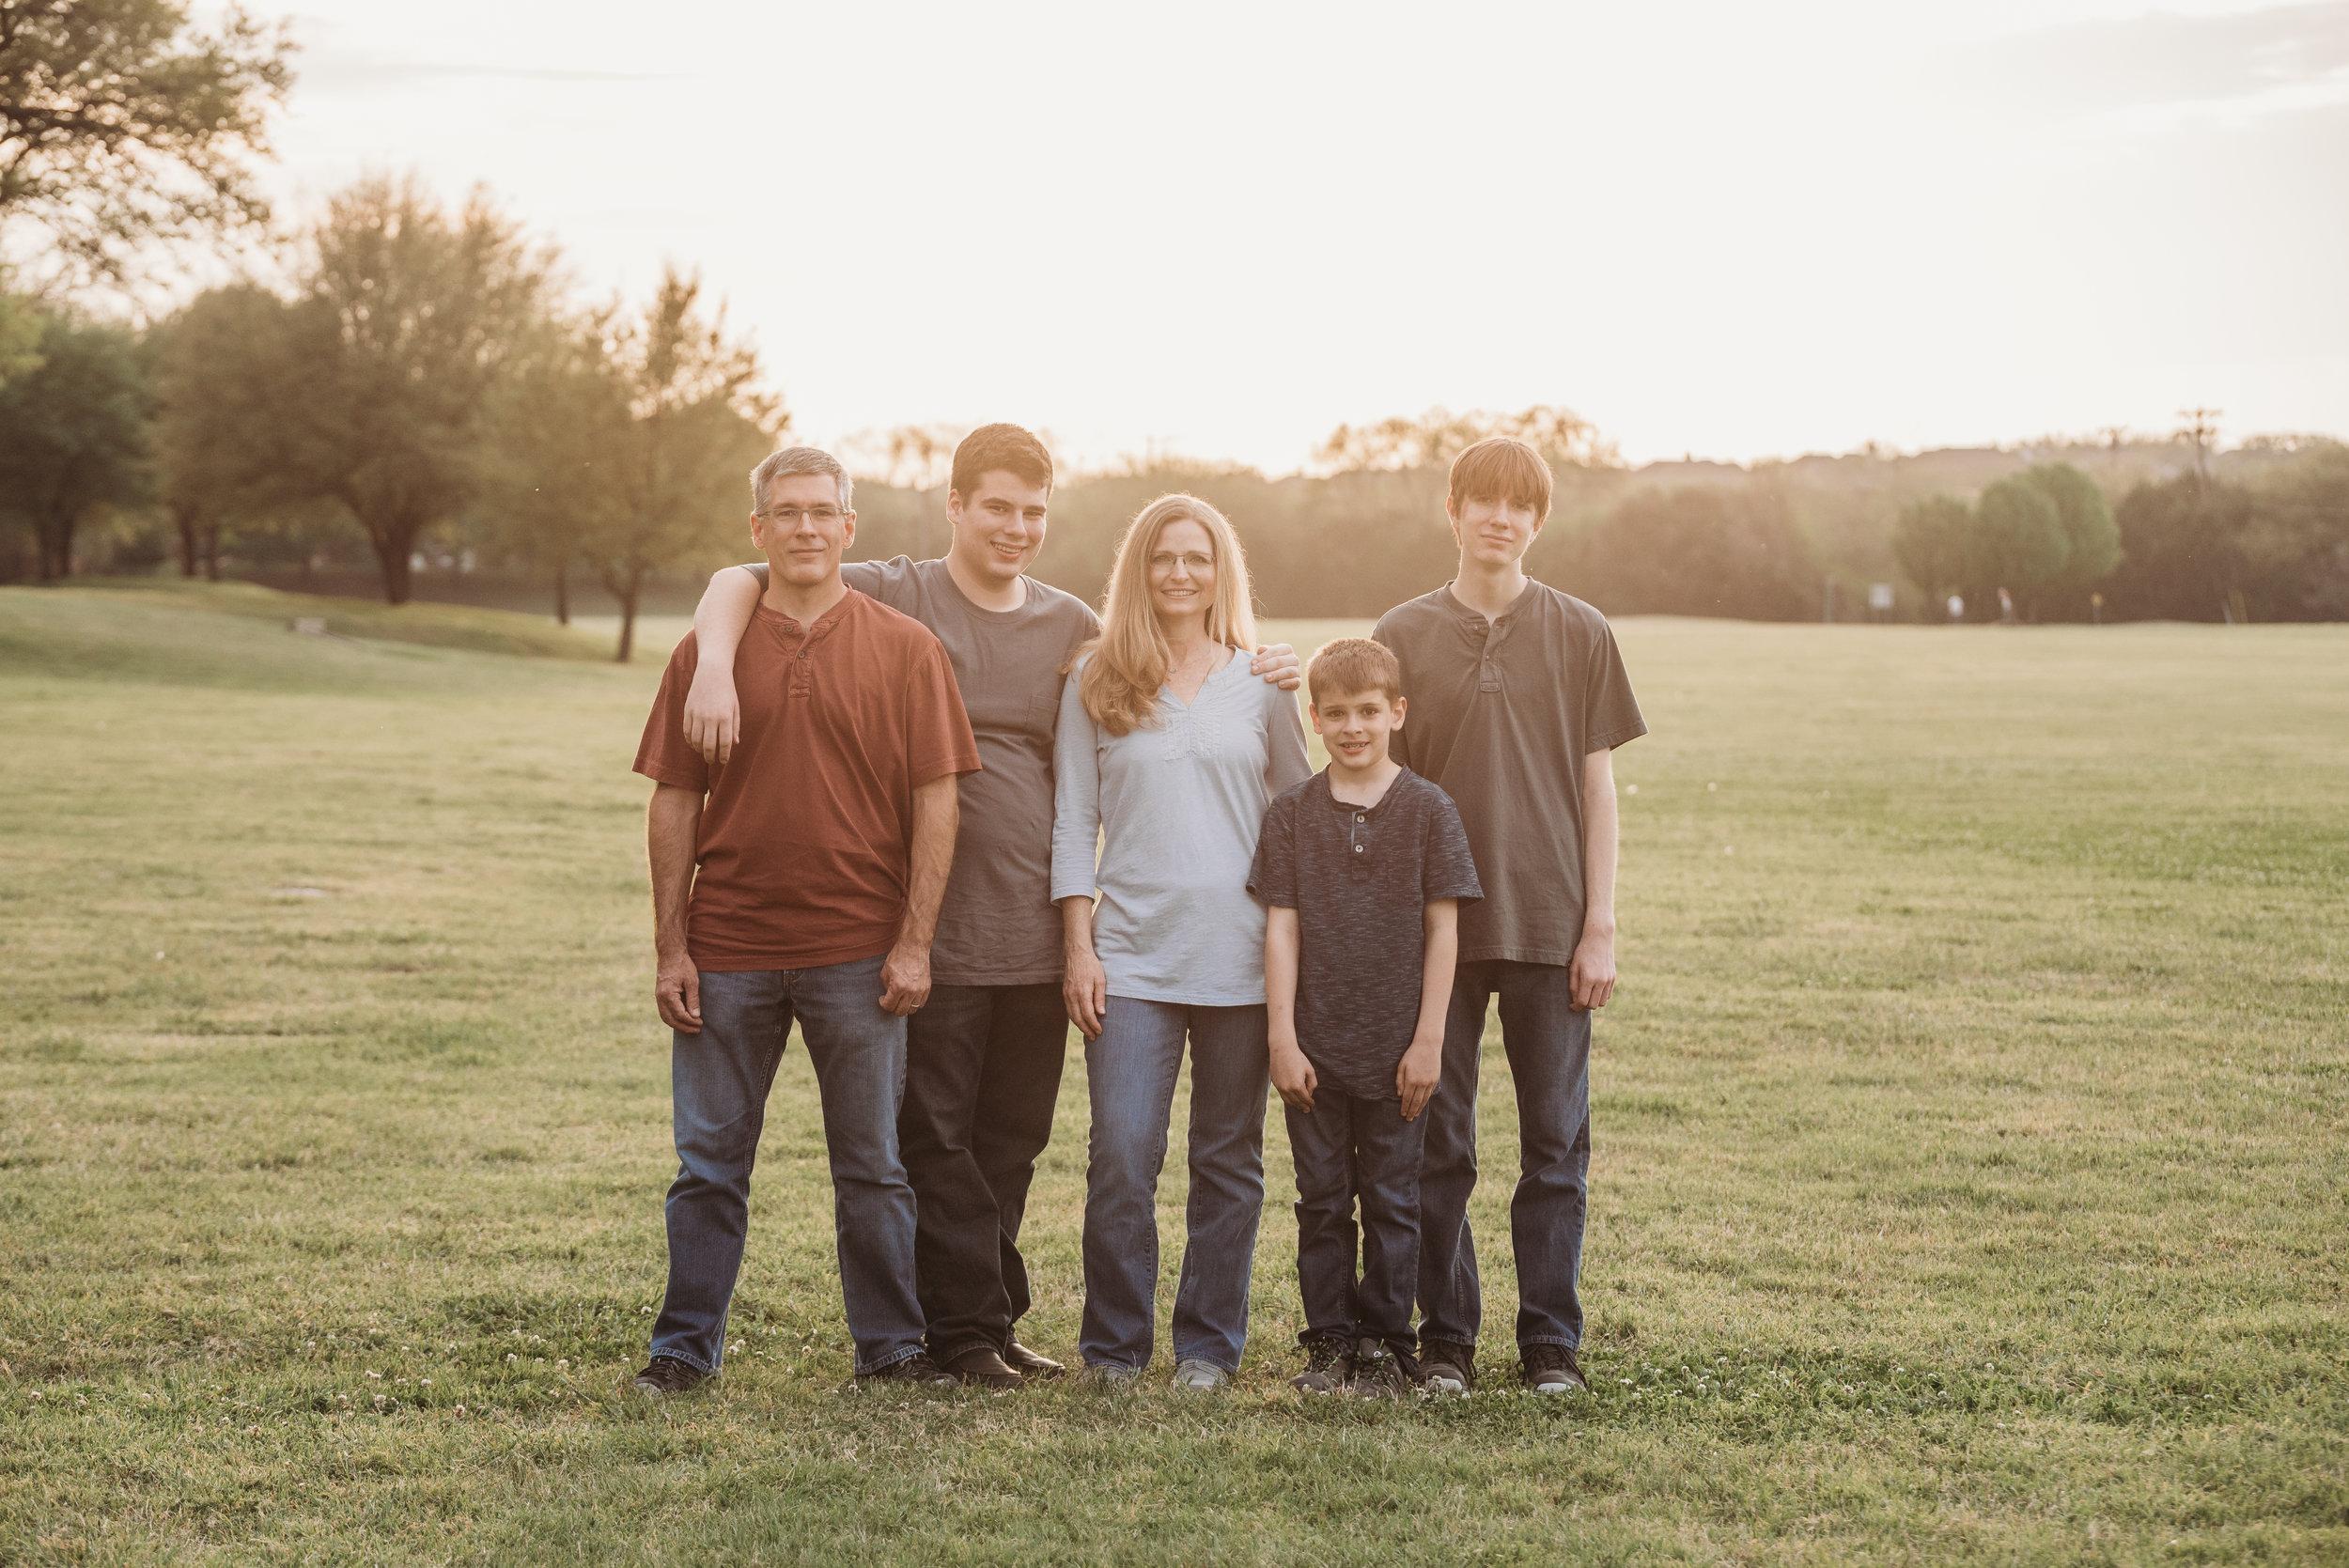 Round Rock Family Photographer-Emily Ingalls Photography-Austin Texas Family Photographer-Pflugerville Texas Family Photographer